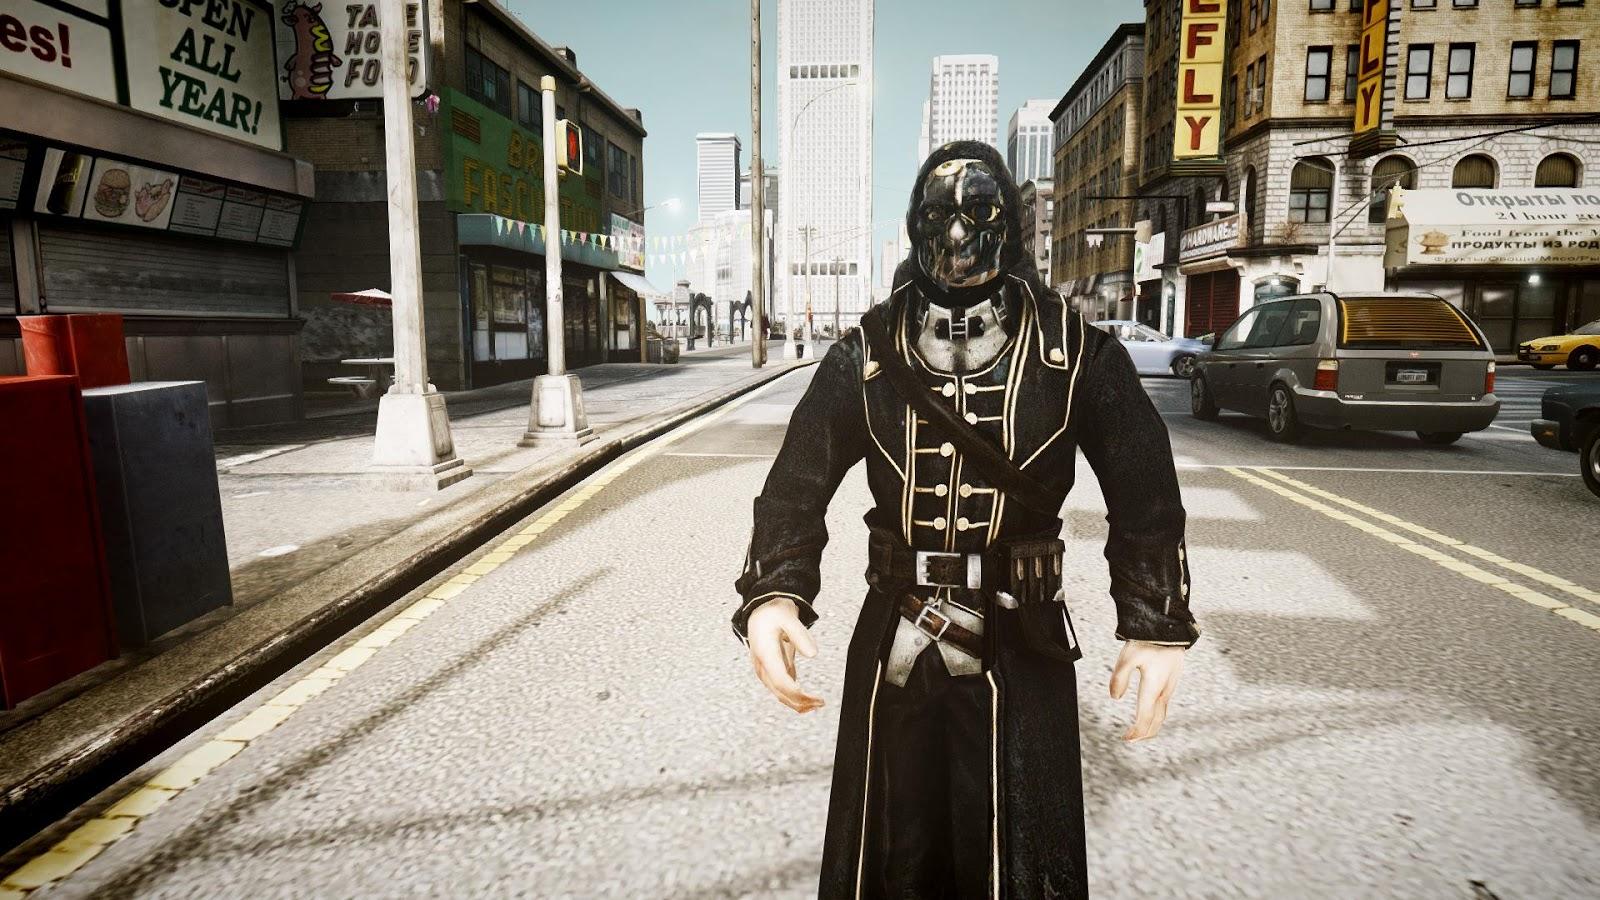 GTA 5,GTAV,GTA IV Mods and Skins: Dishonored Corvo Attano